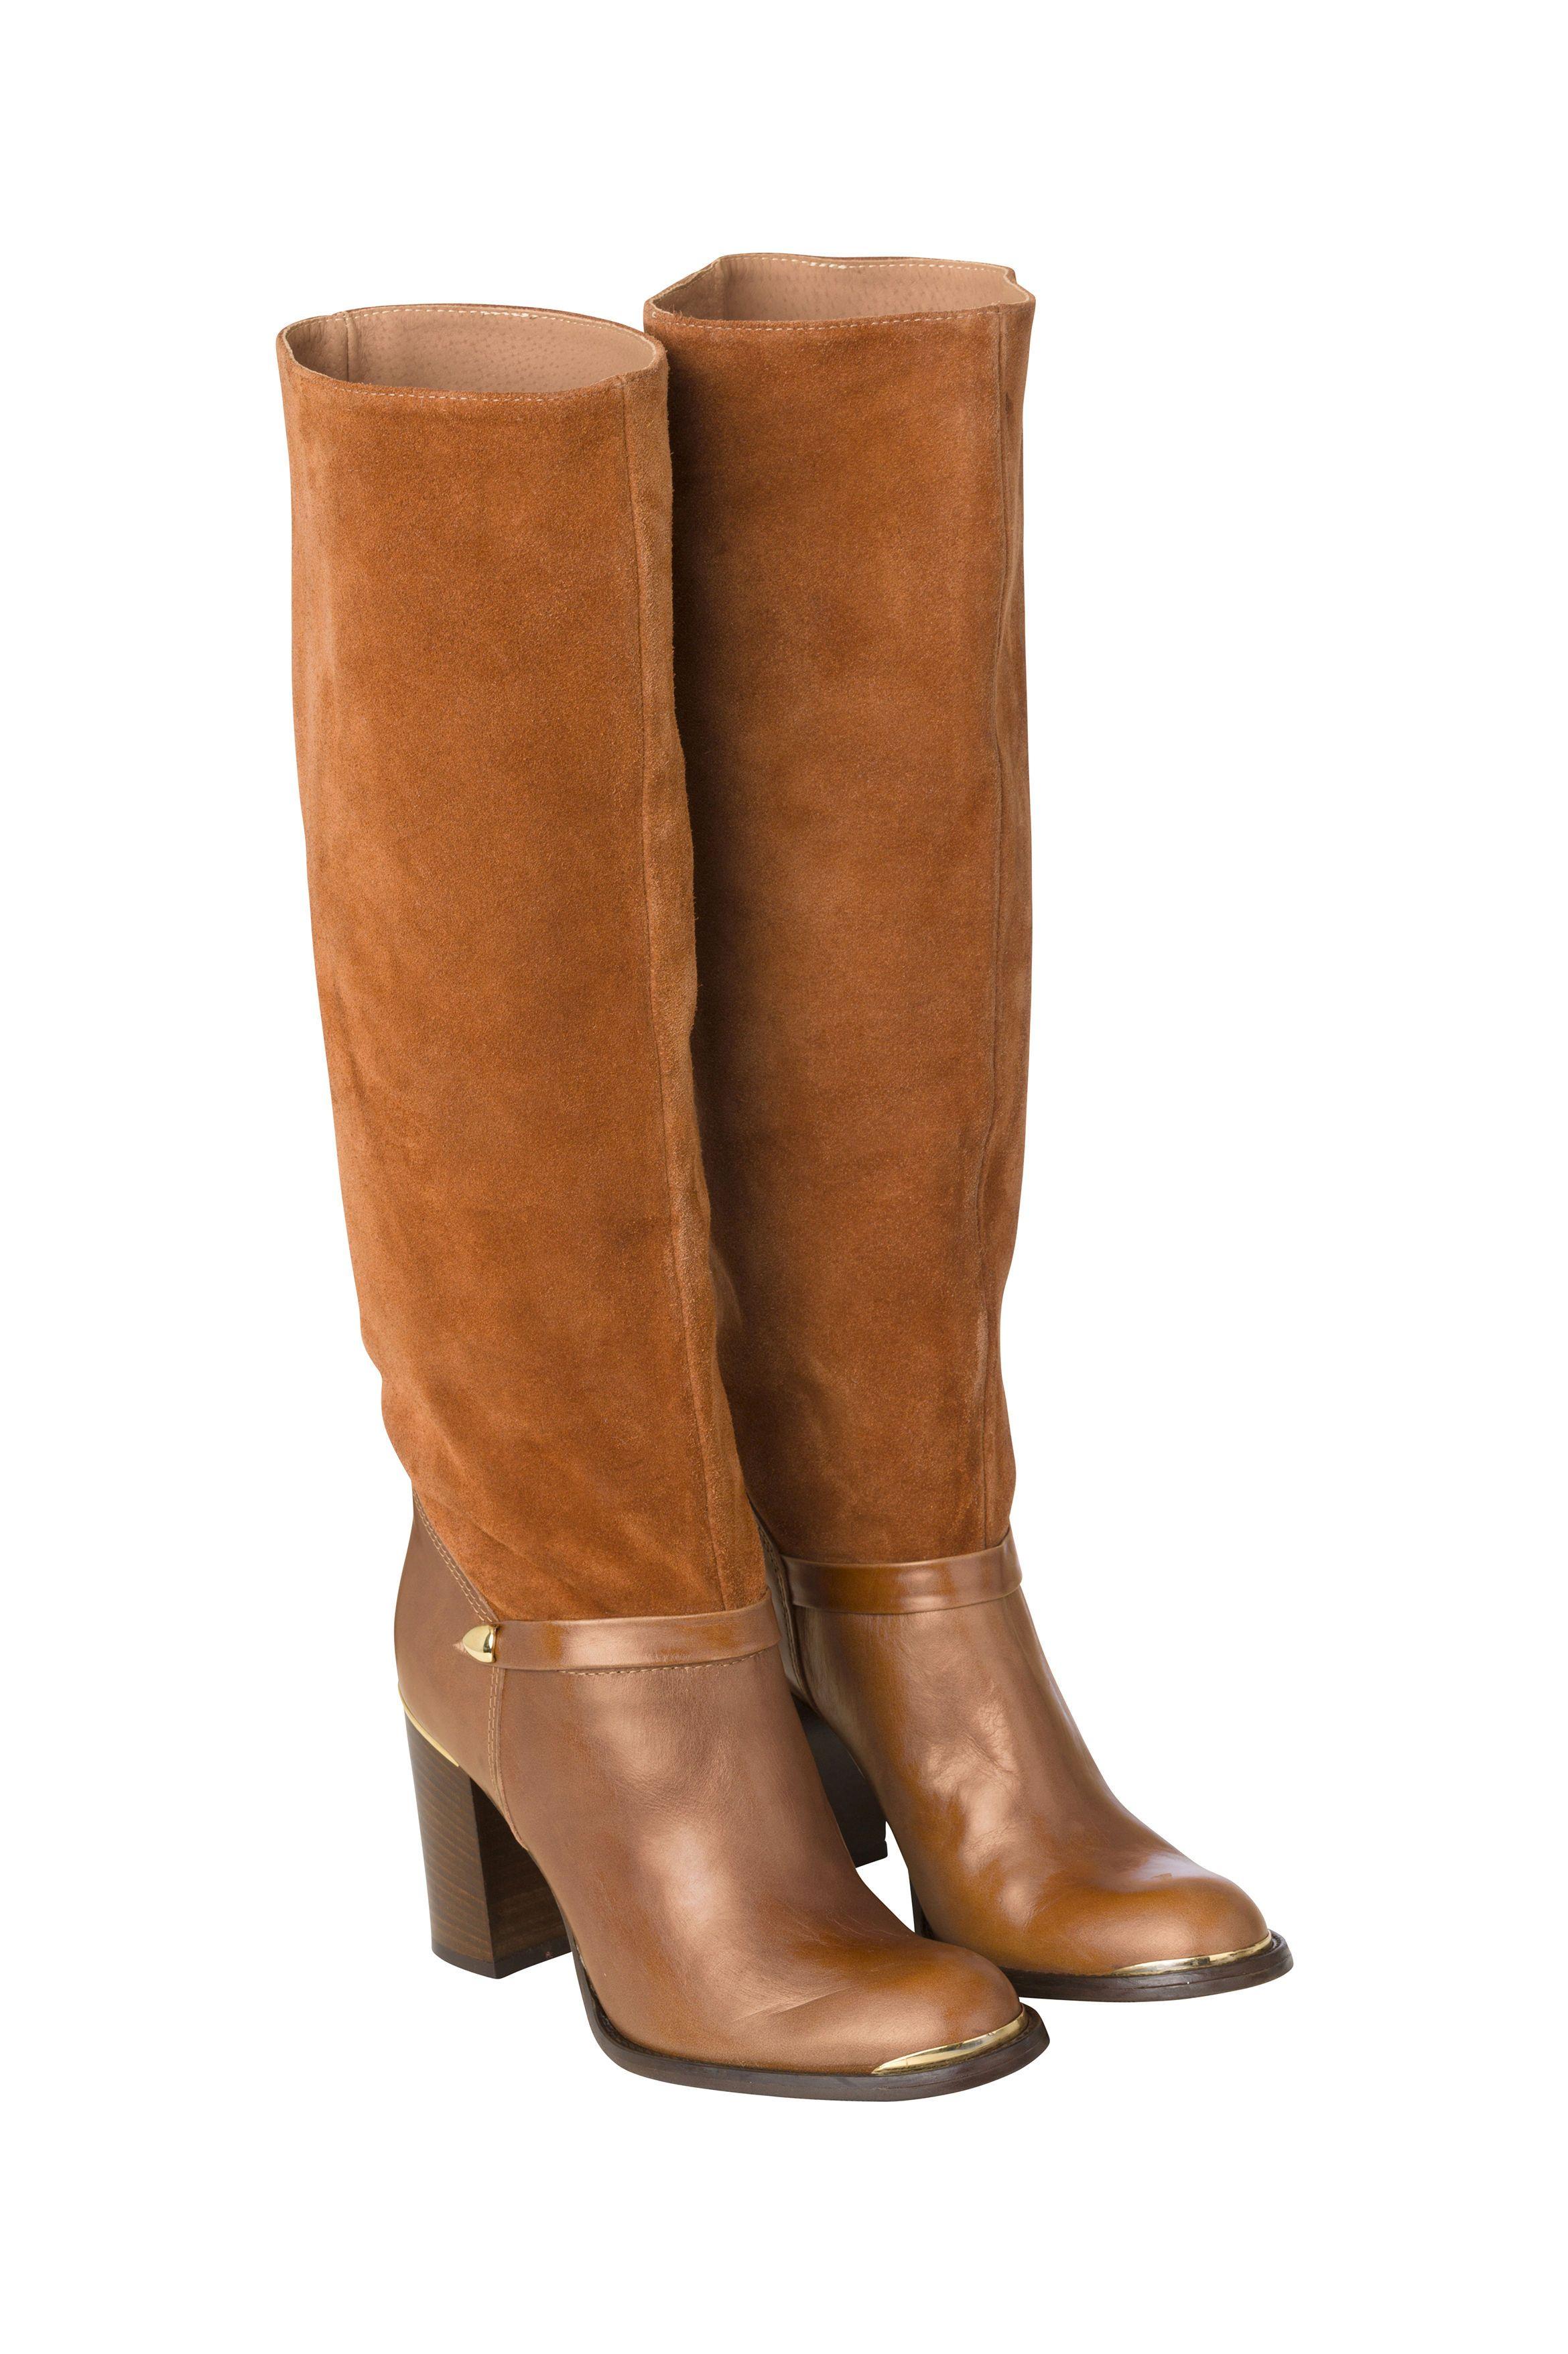 Ganni Thea Leather Boots Ganni Fall Winter 2015